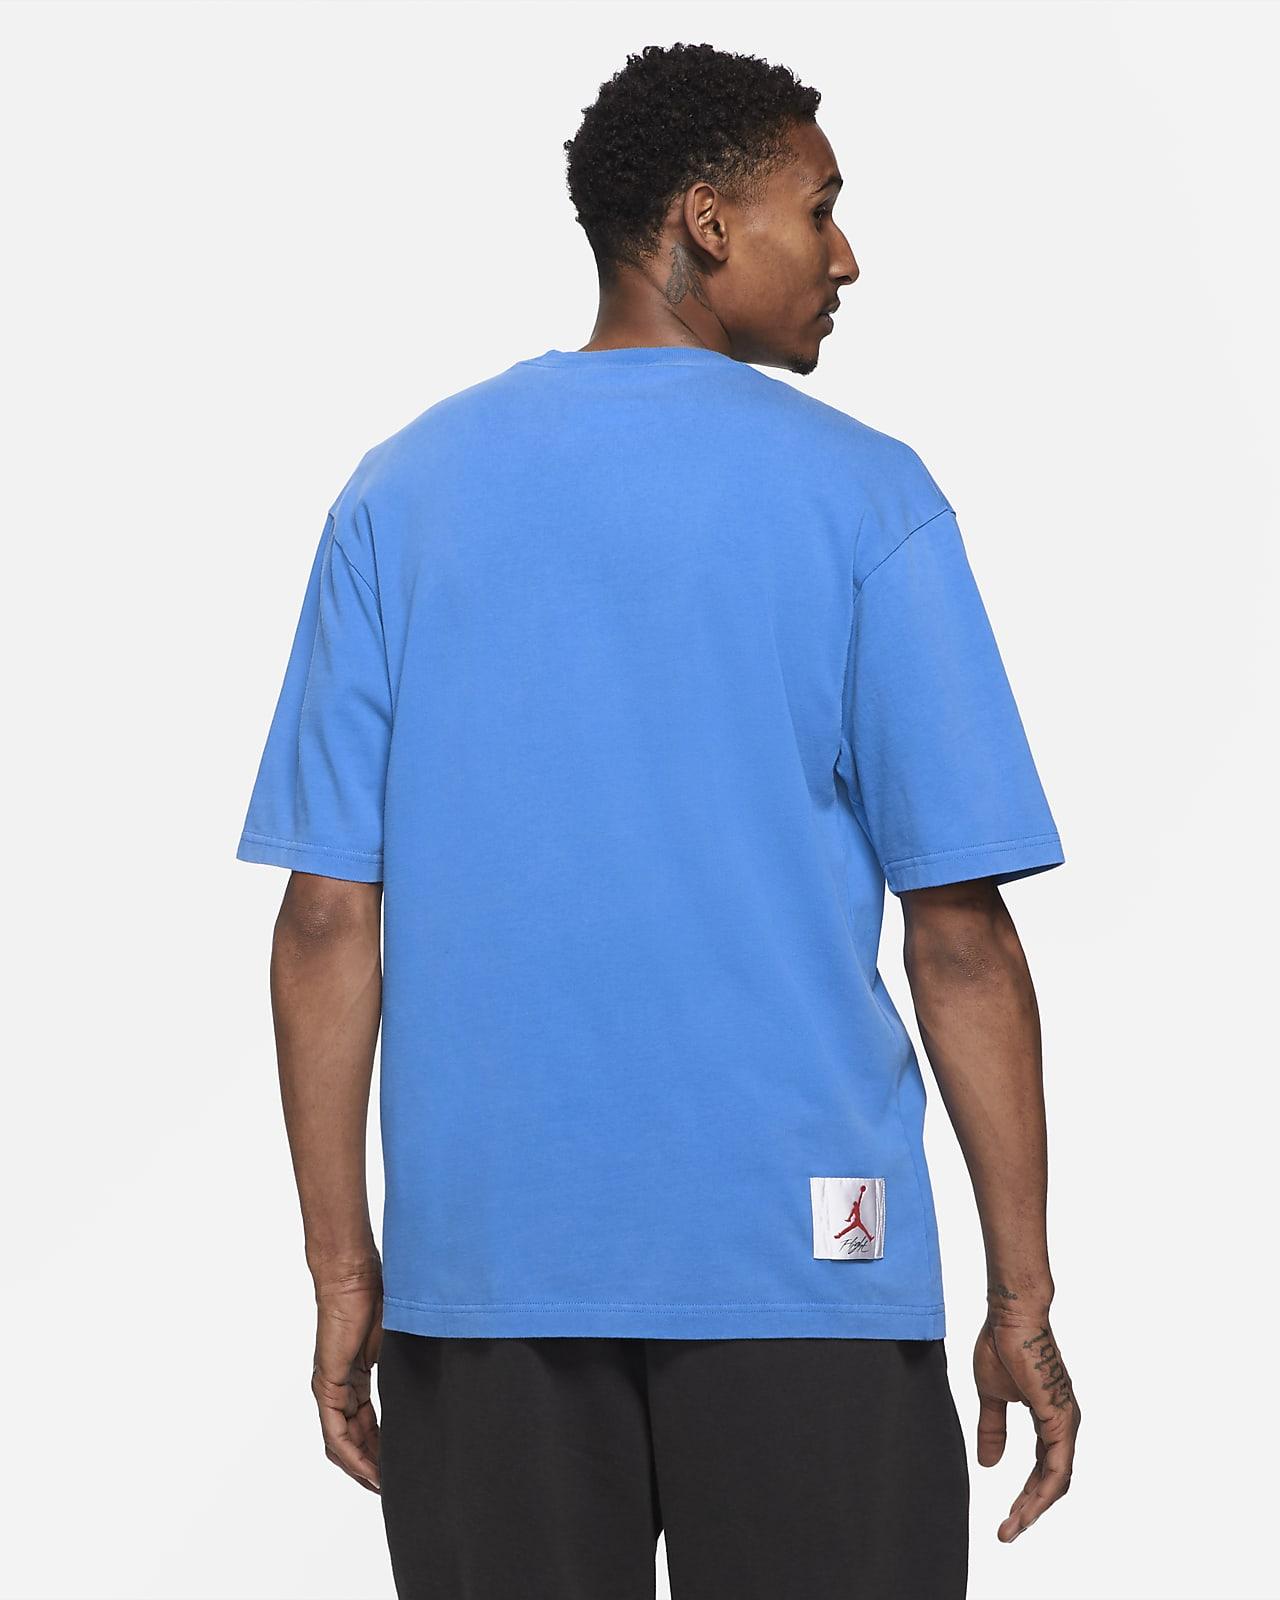 Boys Short Sleeve Shirt Air Force Airplane Kids T-Shirt Girls Unisex Youth T-Shirt Graphic Tee